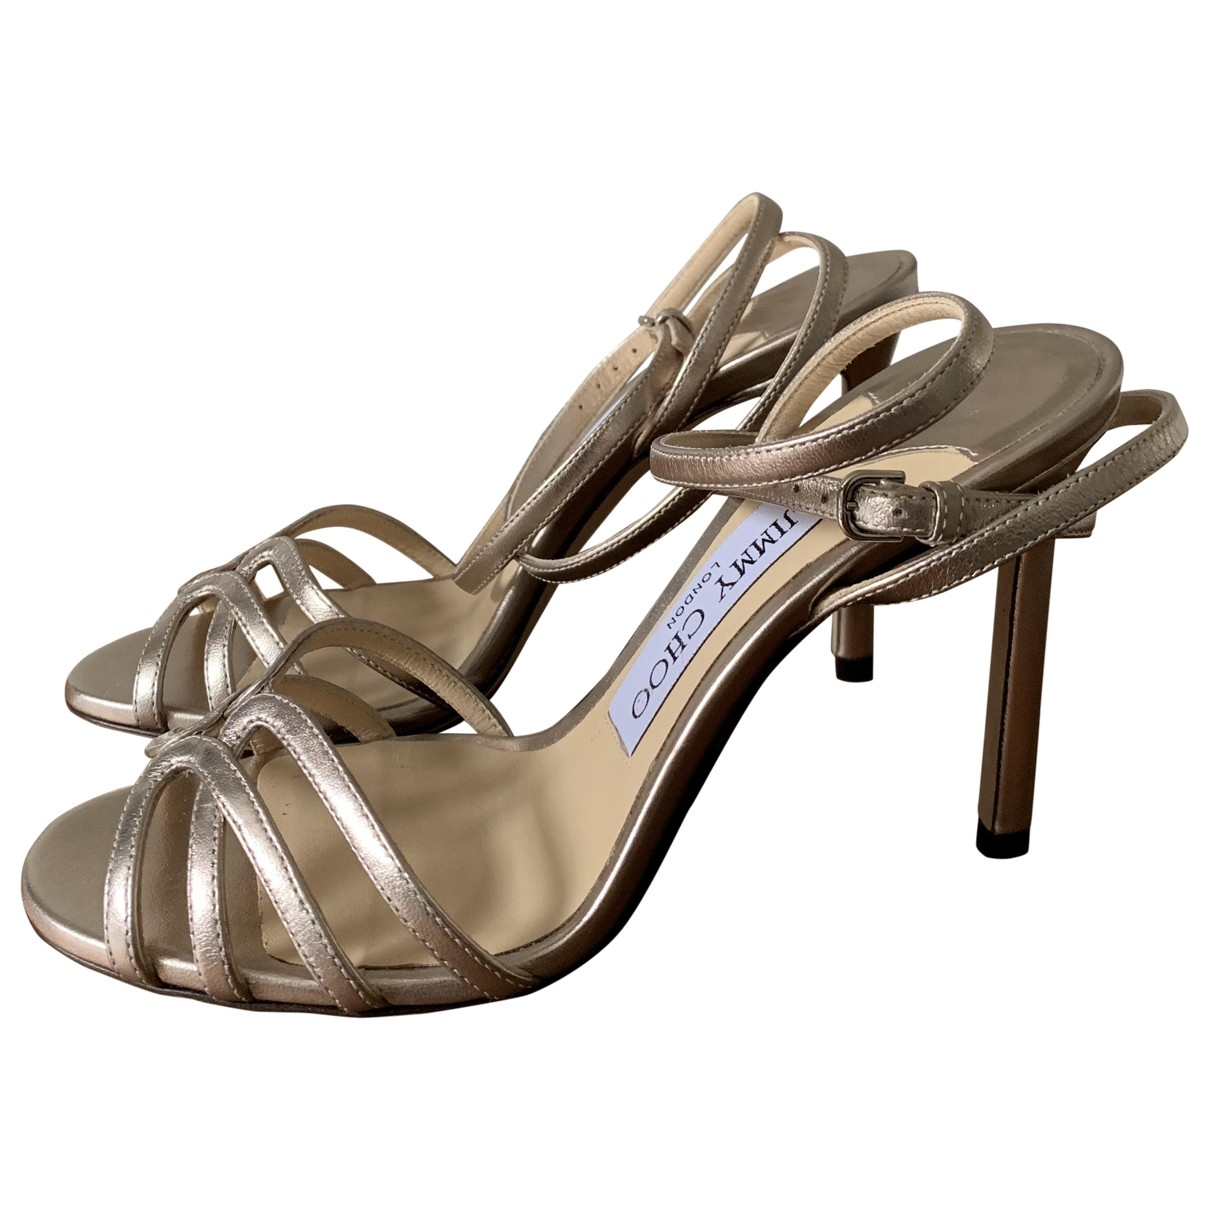 Jimmy Choo \N Gold Leather Sandals for Women 35.5 EU